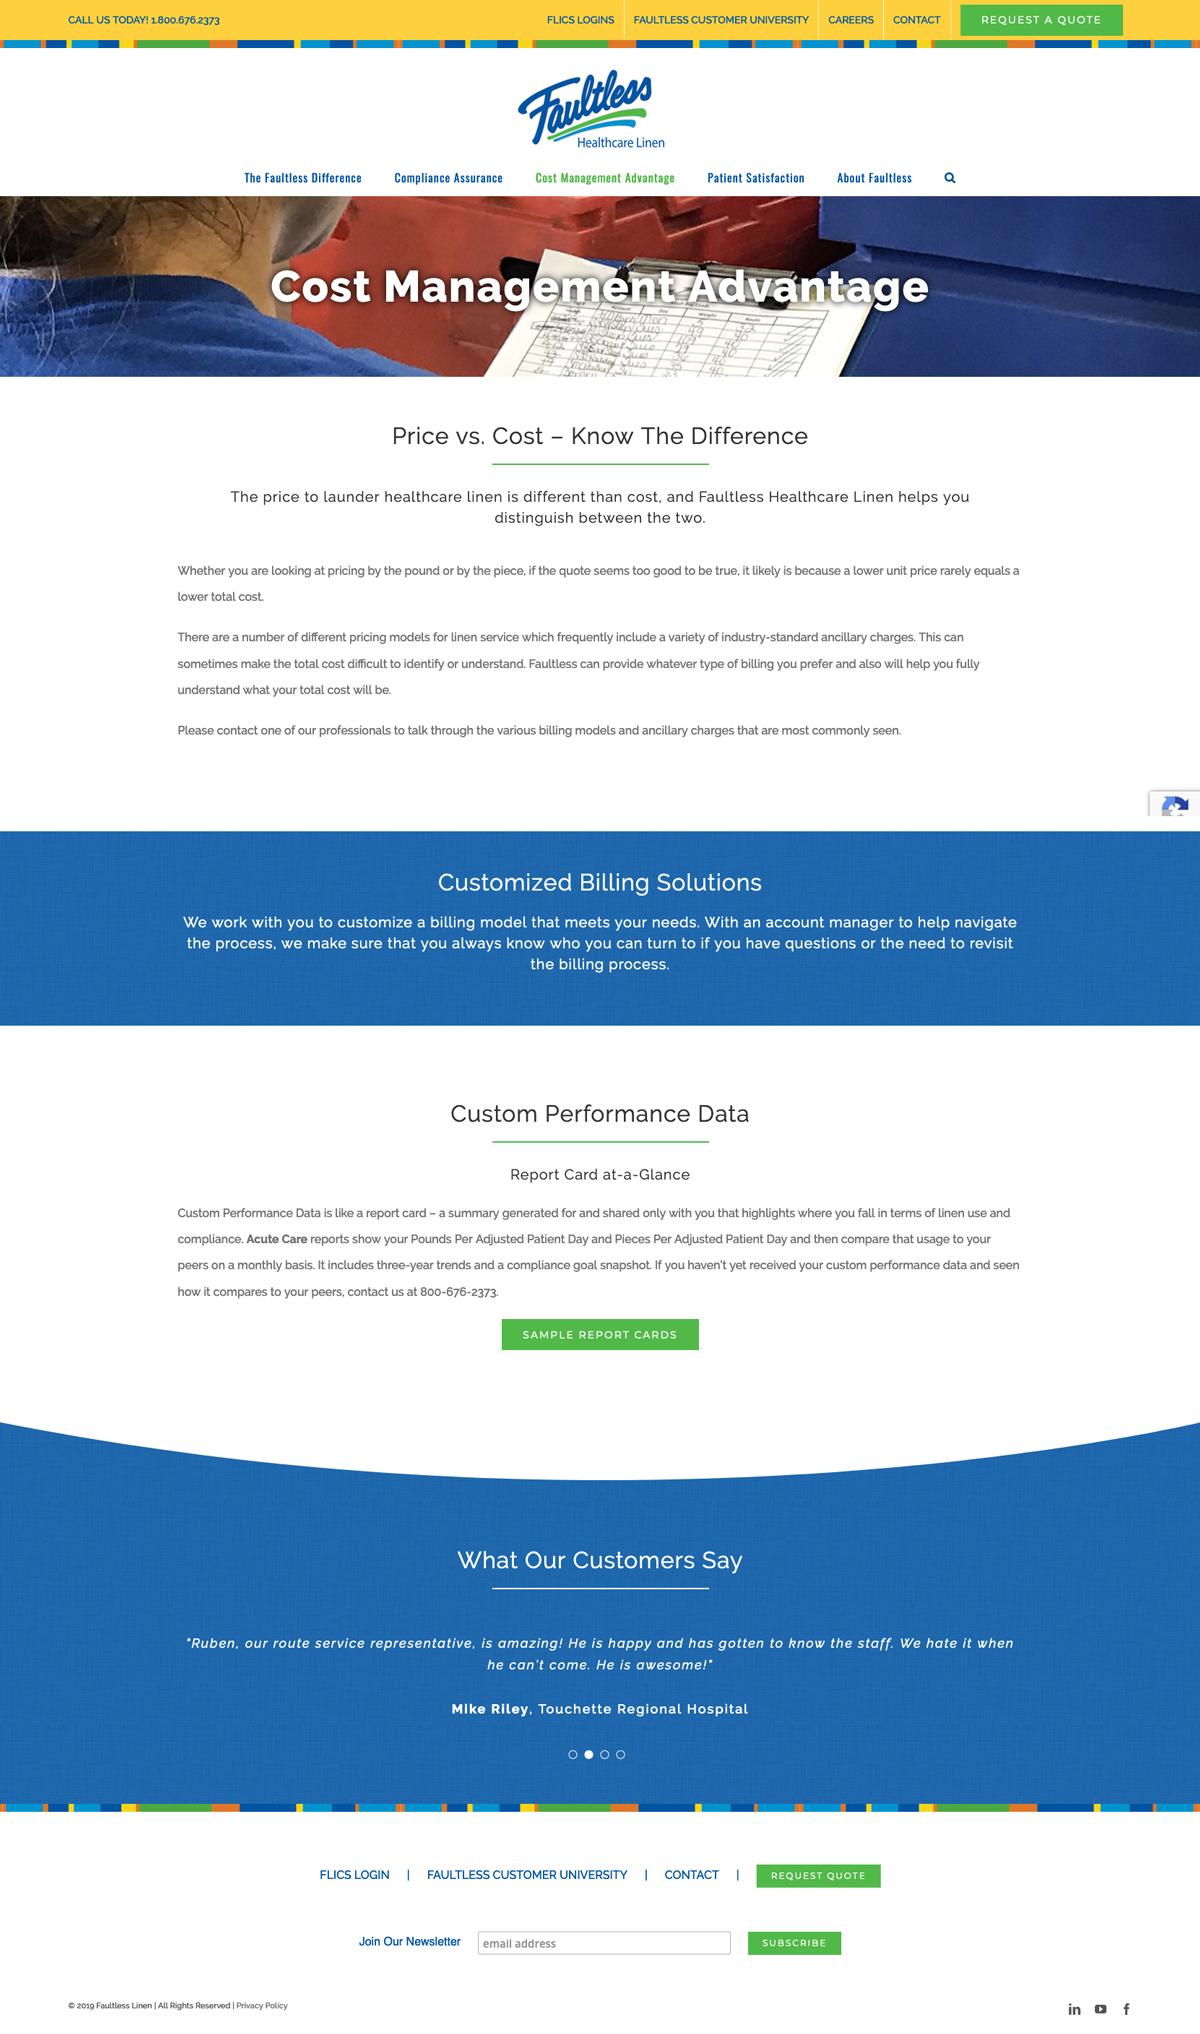 Company Website Design for Faultless Healthcare Linen - Cost Management Advantage